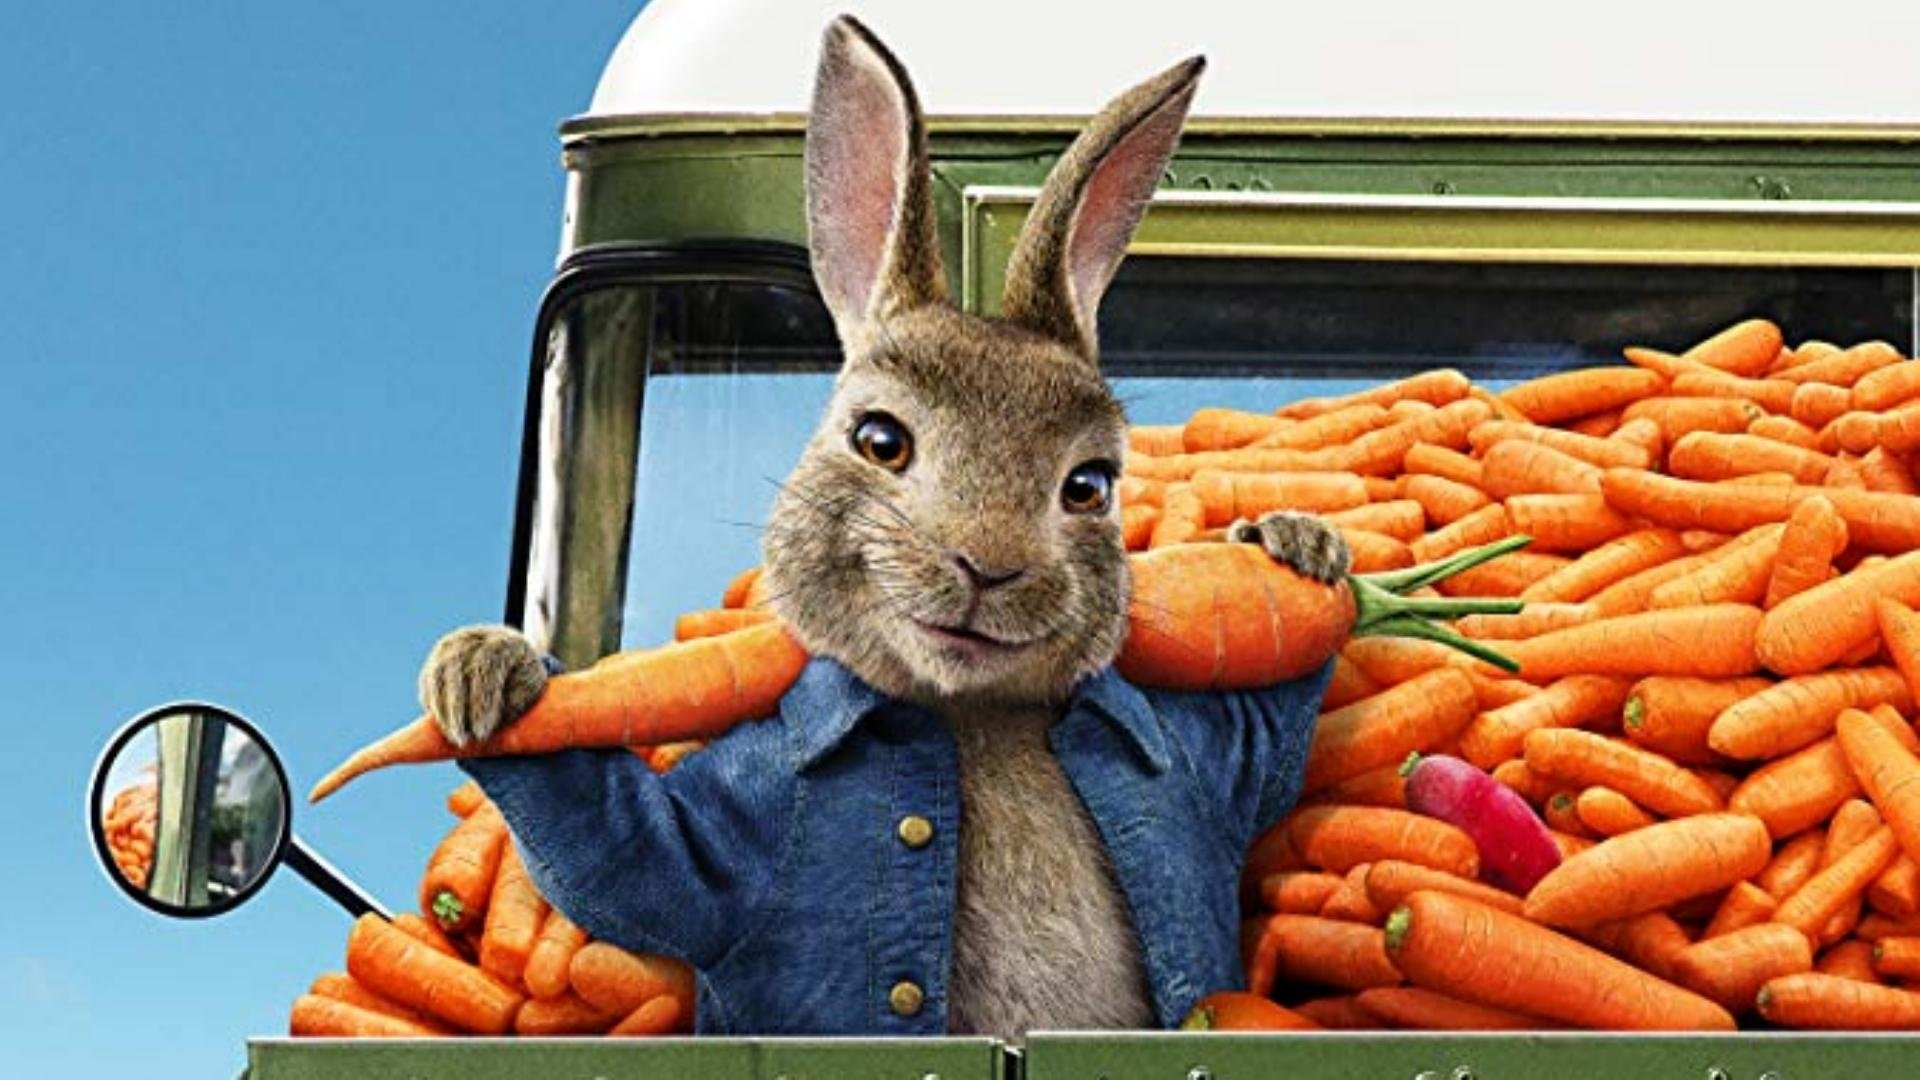 Peter Rabbit 2 - Un birbante in fuga: Data ufficiale di uscita e trama